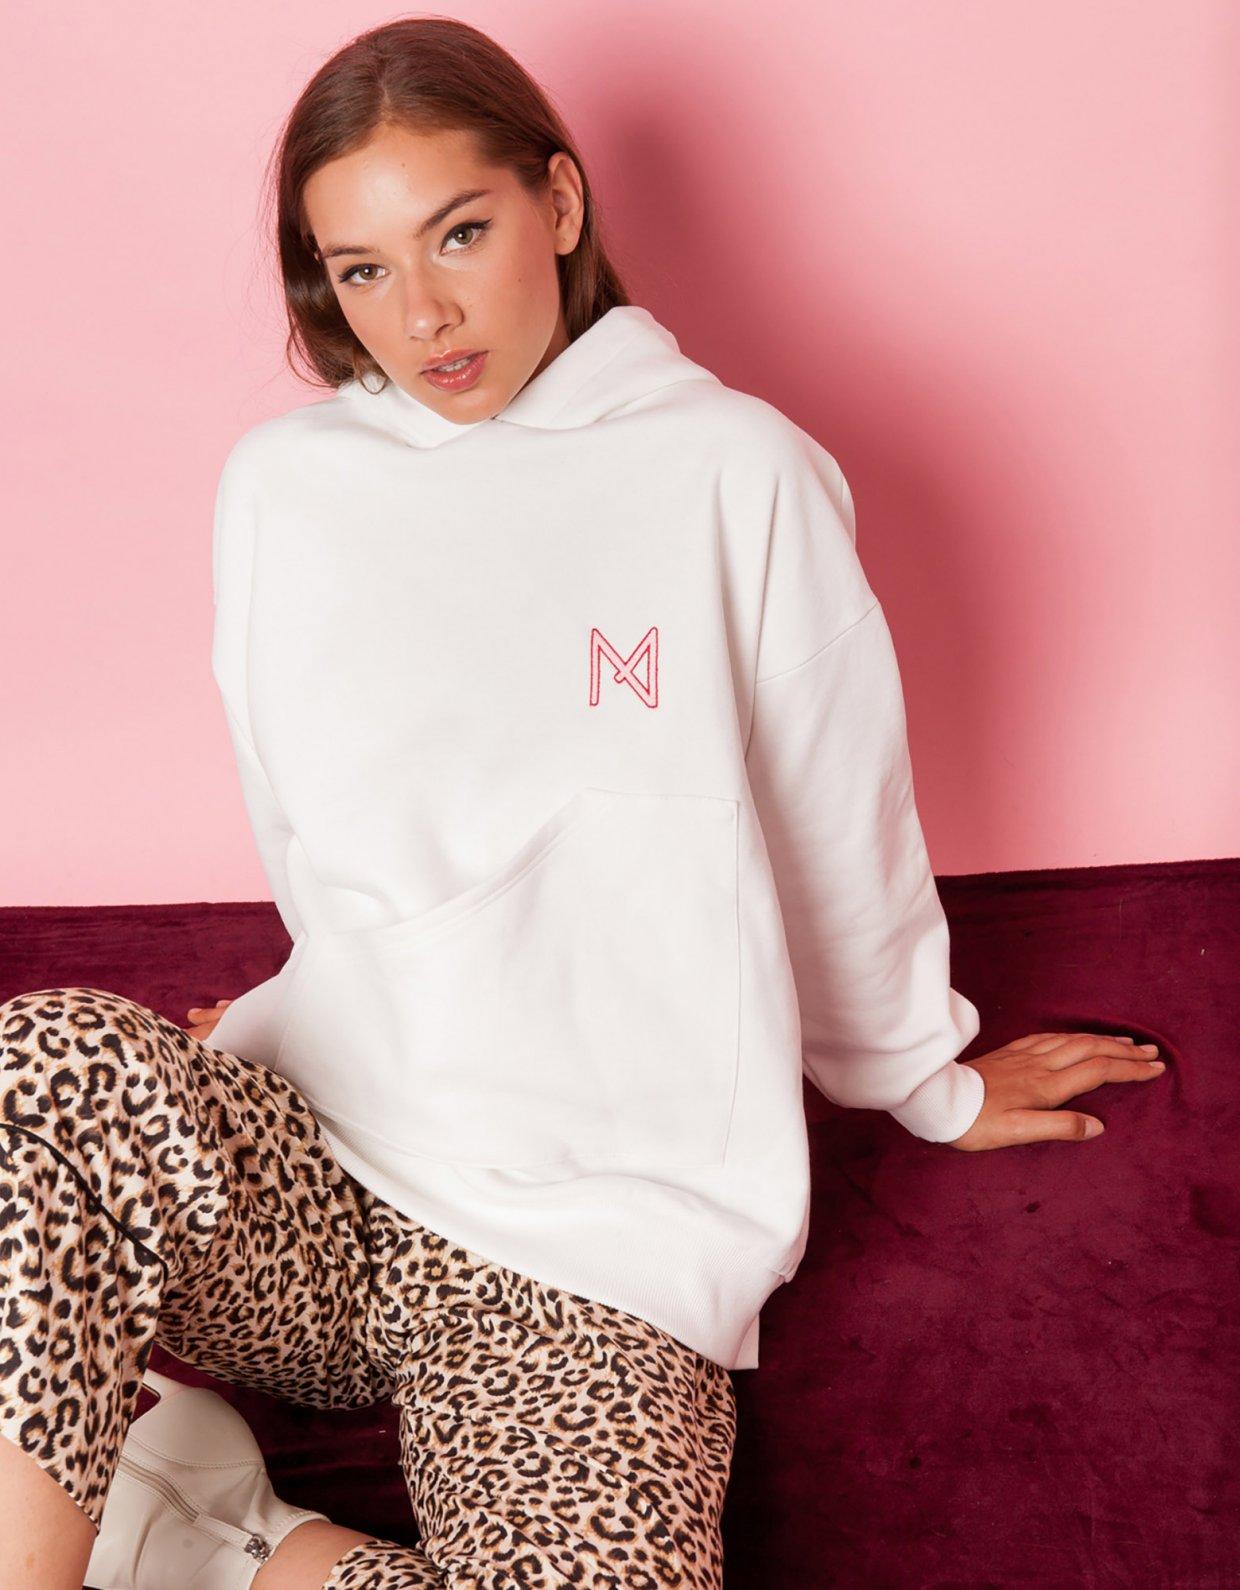 Mallory the label Marl brown animal print pants